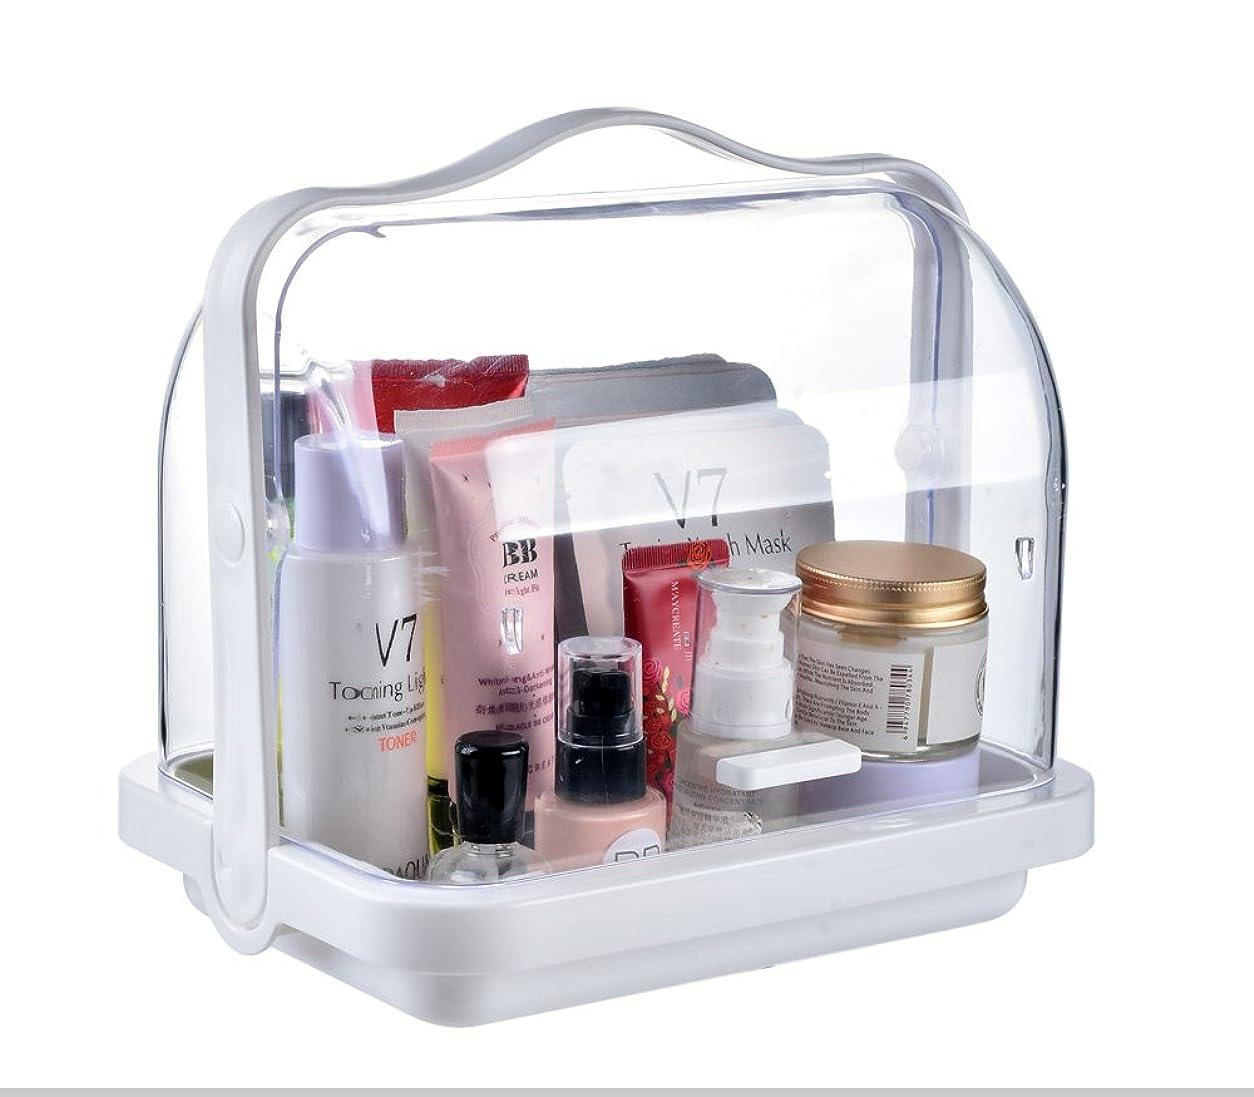 N&Zメイク収納ケース 化粧品収納ボックス スキンケア収納ケース 入浴用品ボックス カバー付き 防水防塵メイクボックス ポータブル 透明ABS 化粧品収納ボックス (S)